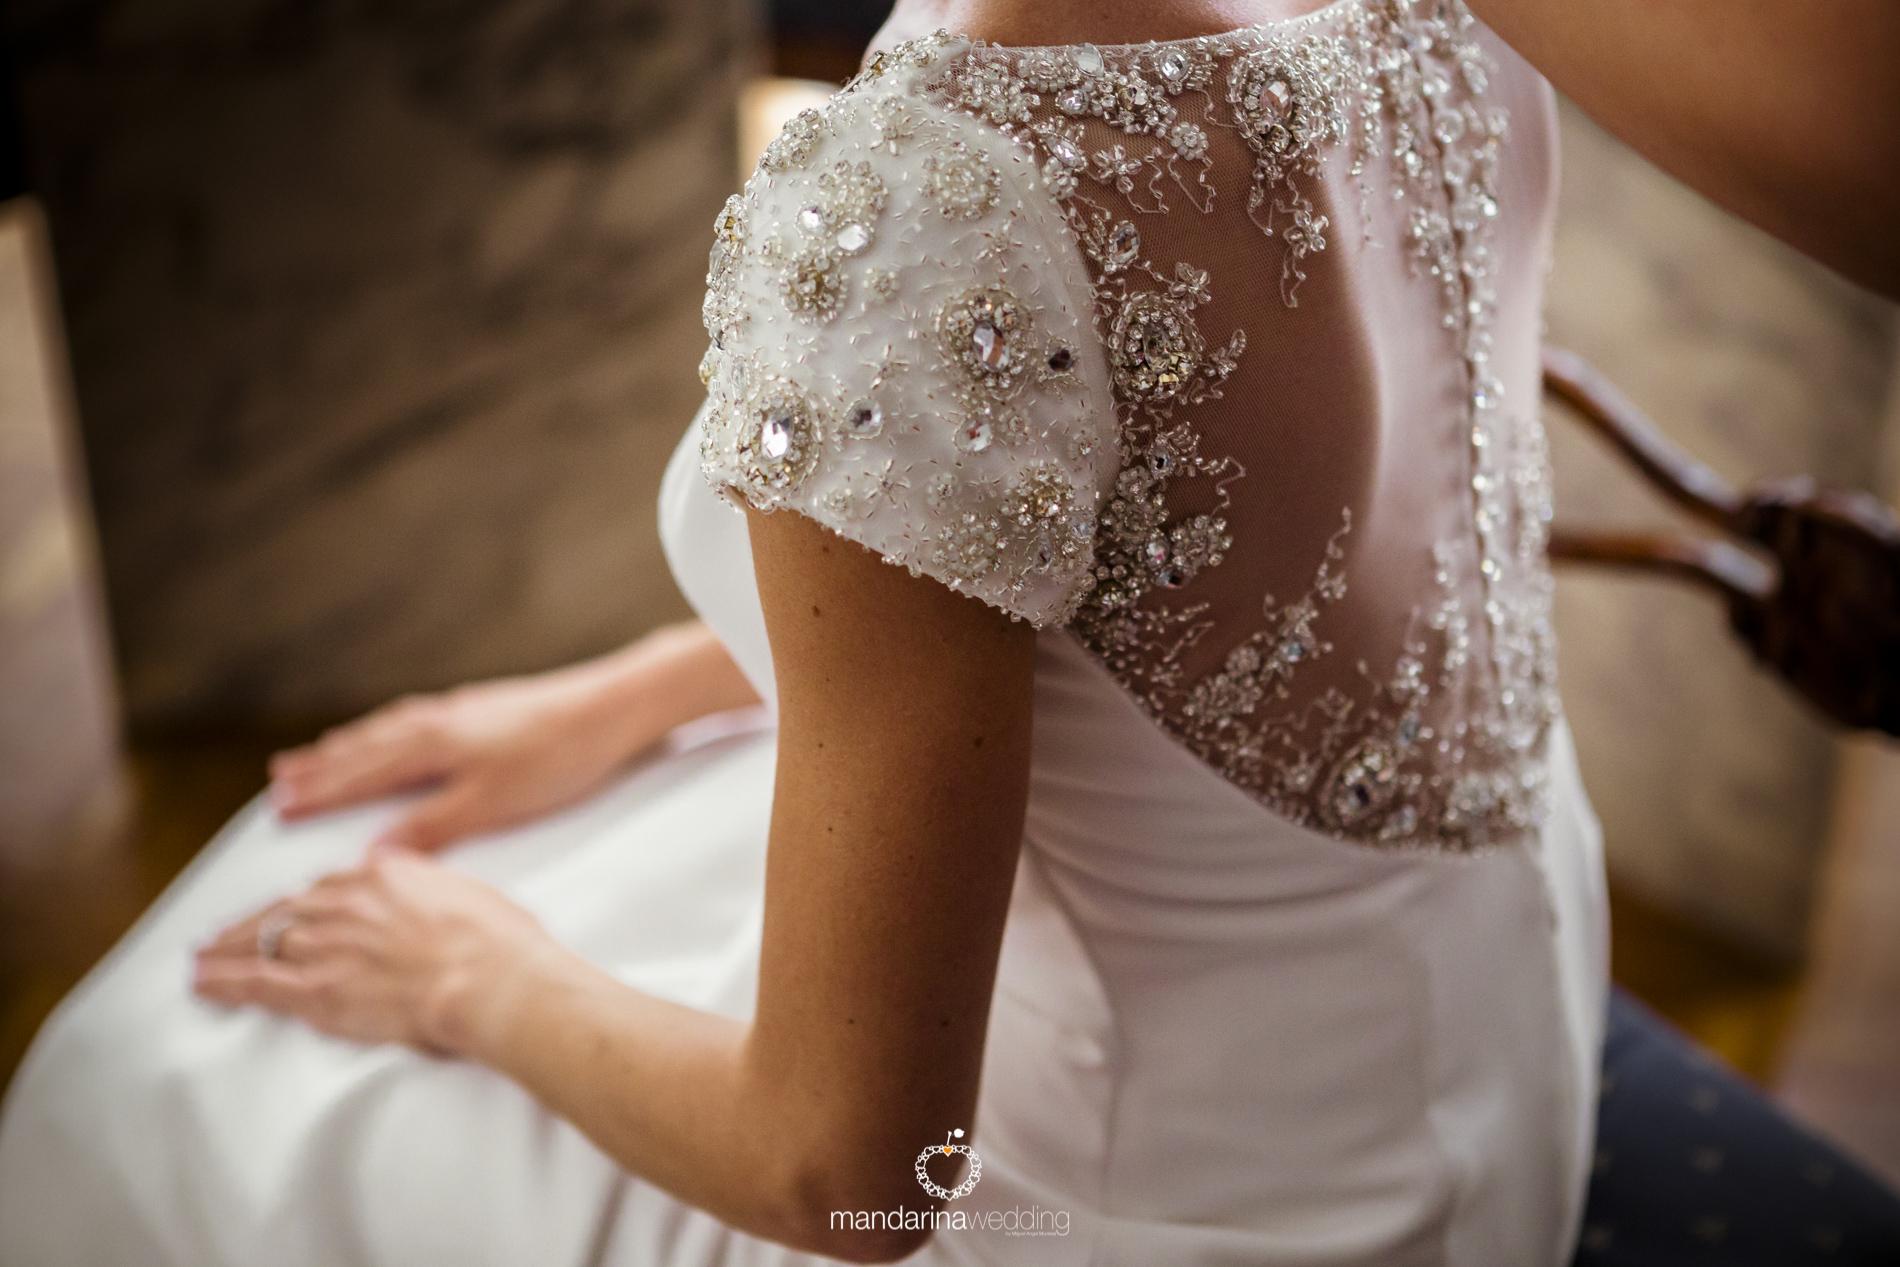 mandaria wedding, fotografos de boda, fotoperiodismo de boda, mejores fotografos de boda, bodas soria, bodas pirineo, bodas Madrid, fotógrafos tarragona_18